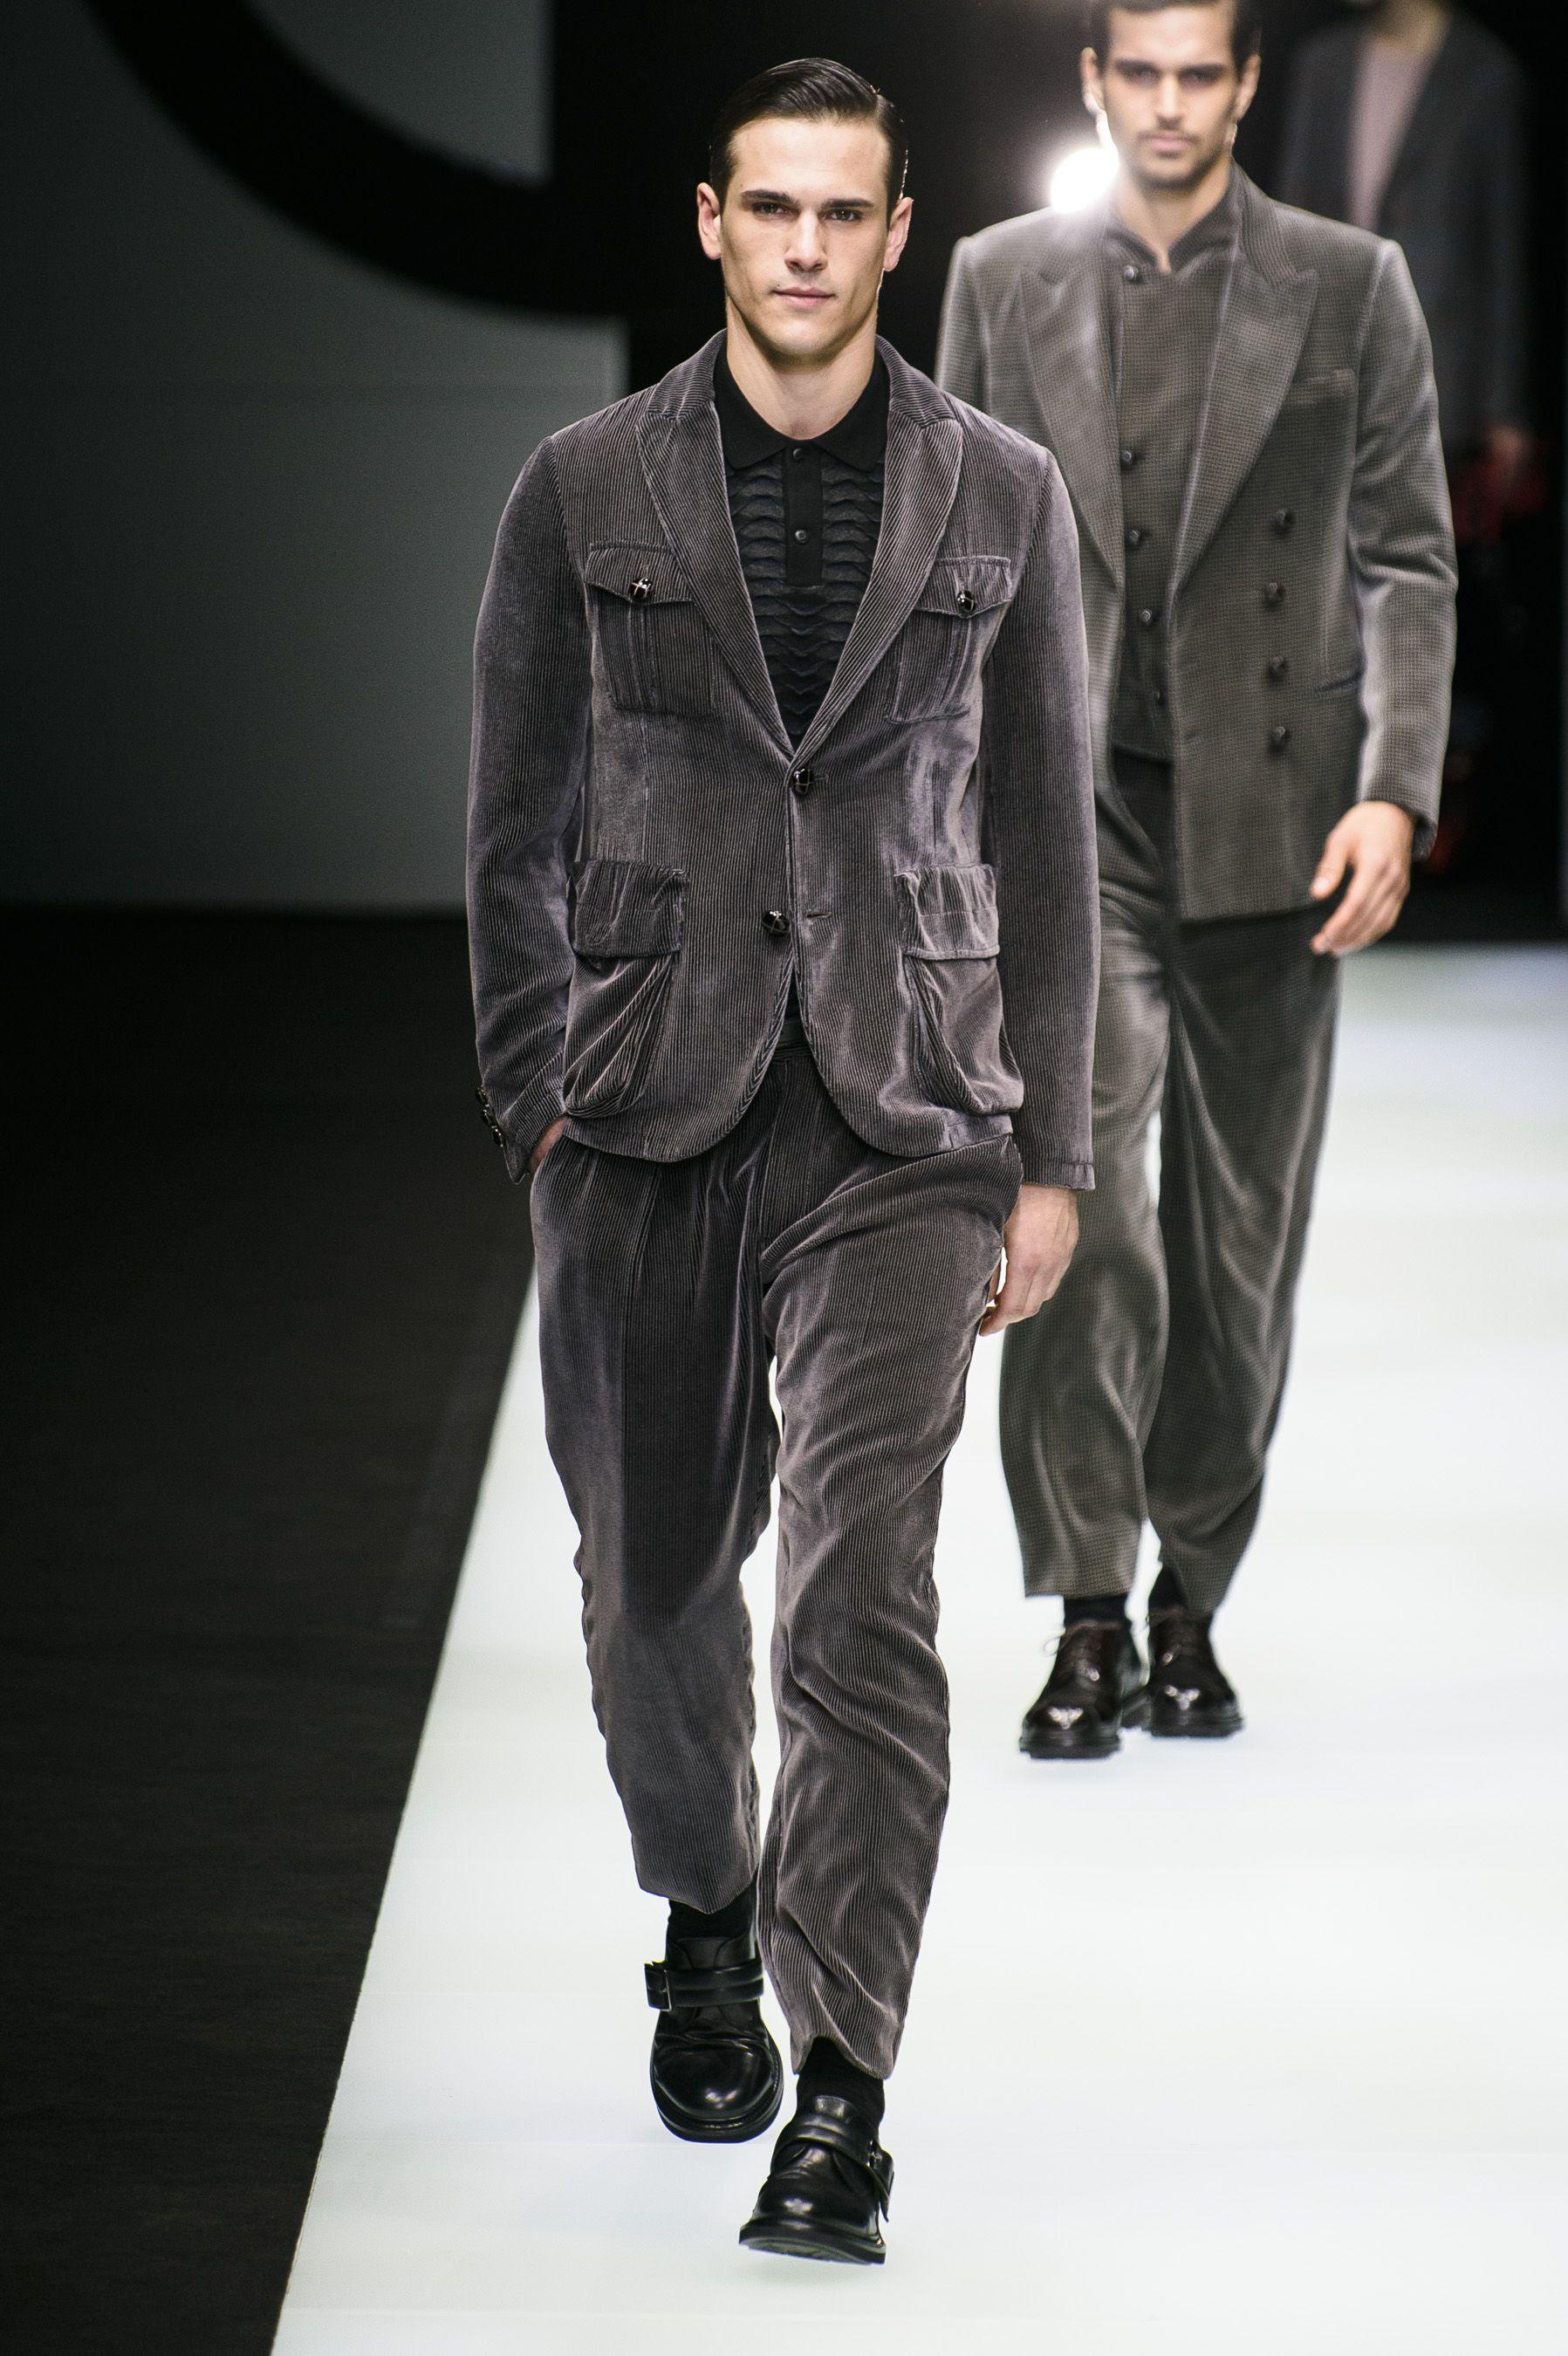 98cc361c02c 96 Looks From Giorgio Armani Fall 2018 MYFW Show – Giorgio Armani Runway at  Milan Fashion Week